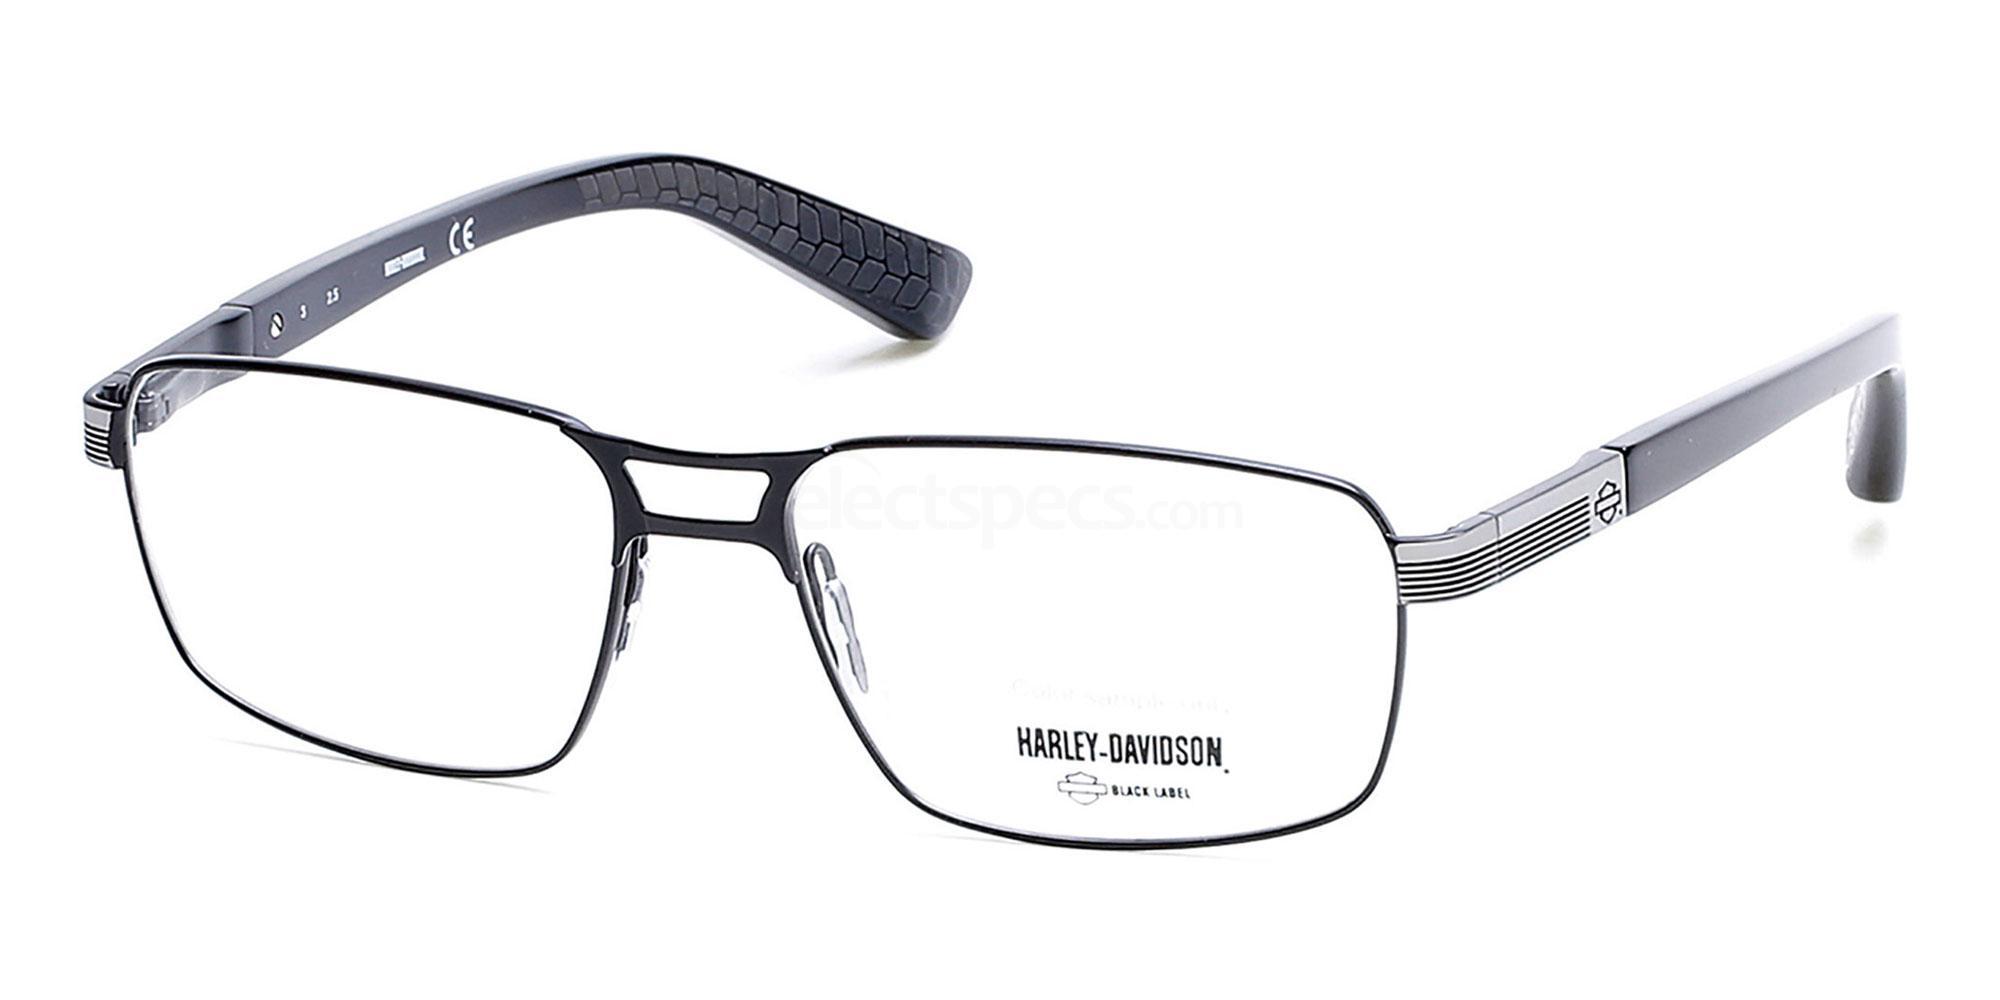 001 HD 1035 Glasses, Harley Davidson